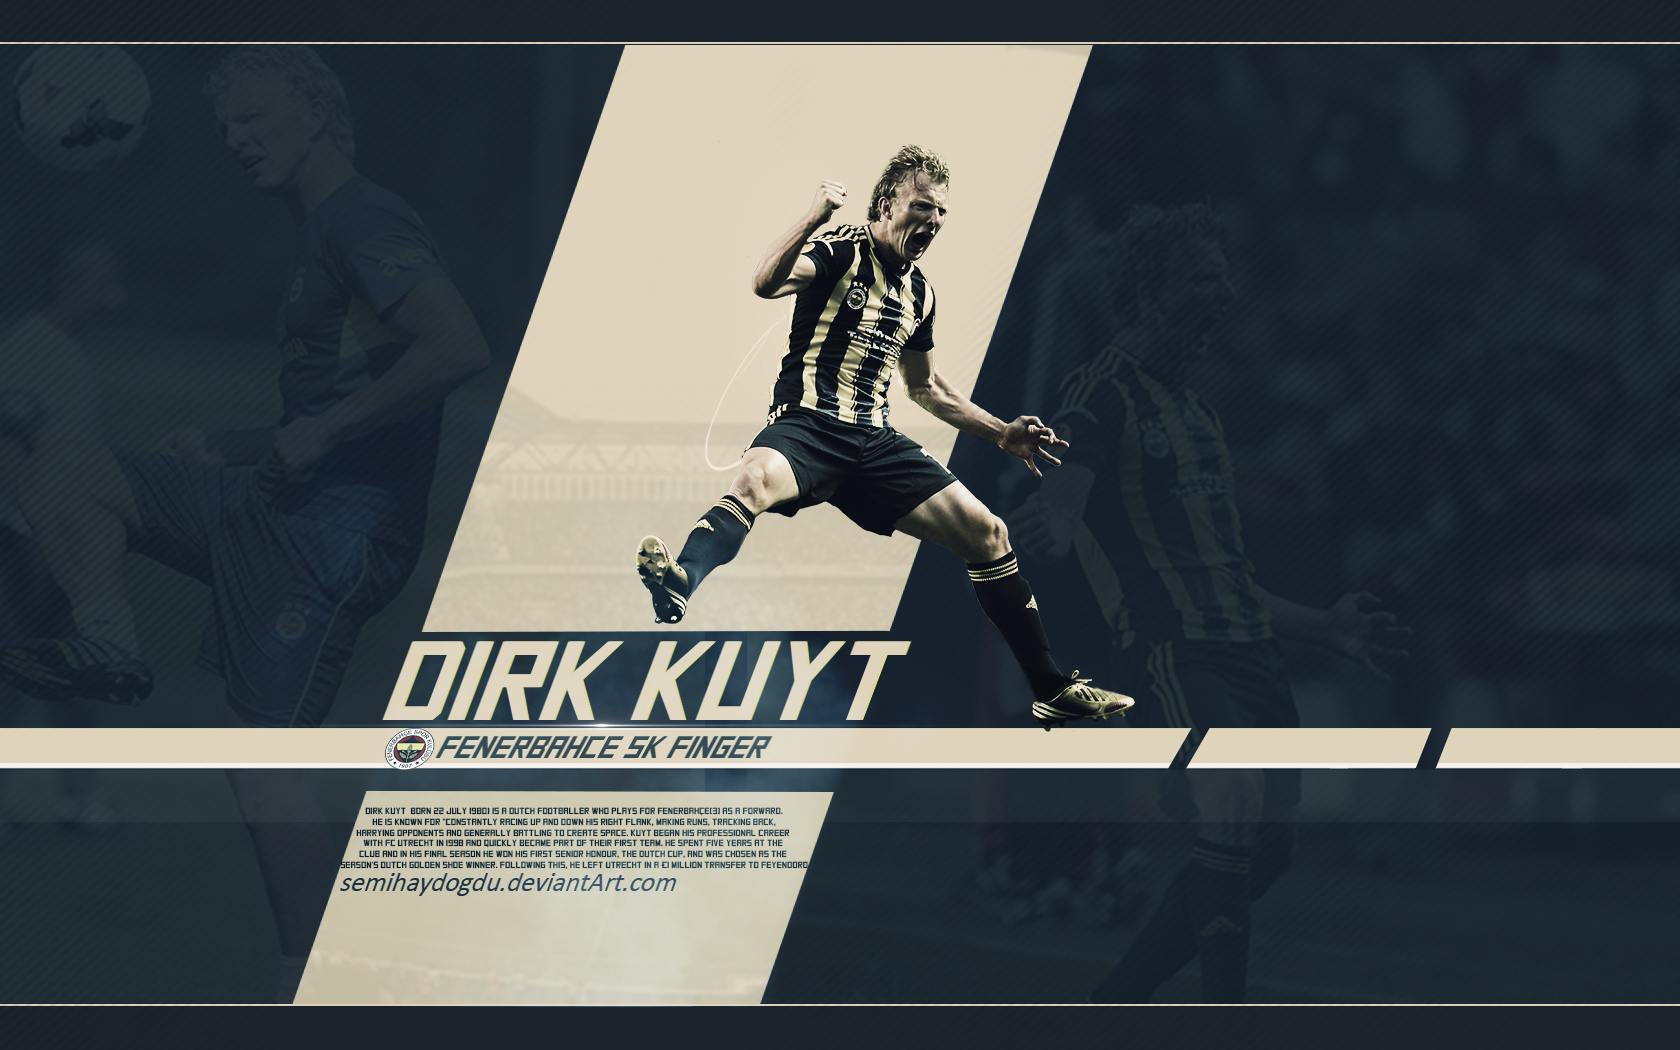 Dirk Kuyt Wallpaper by SemihAydogdu